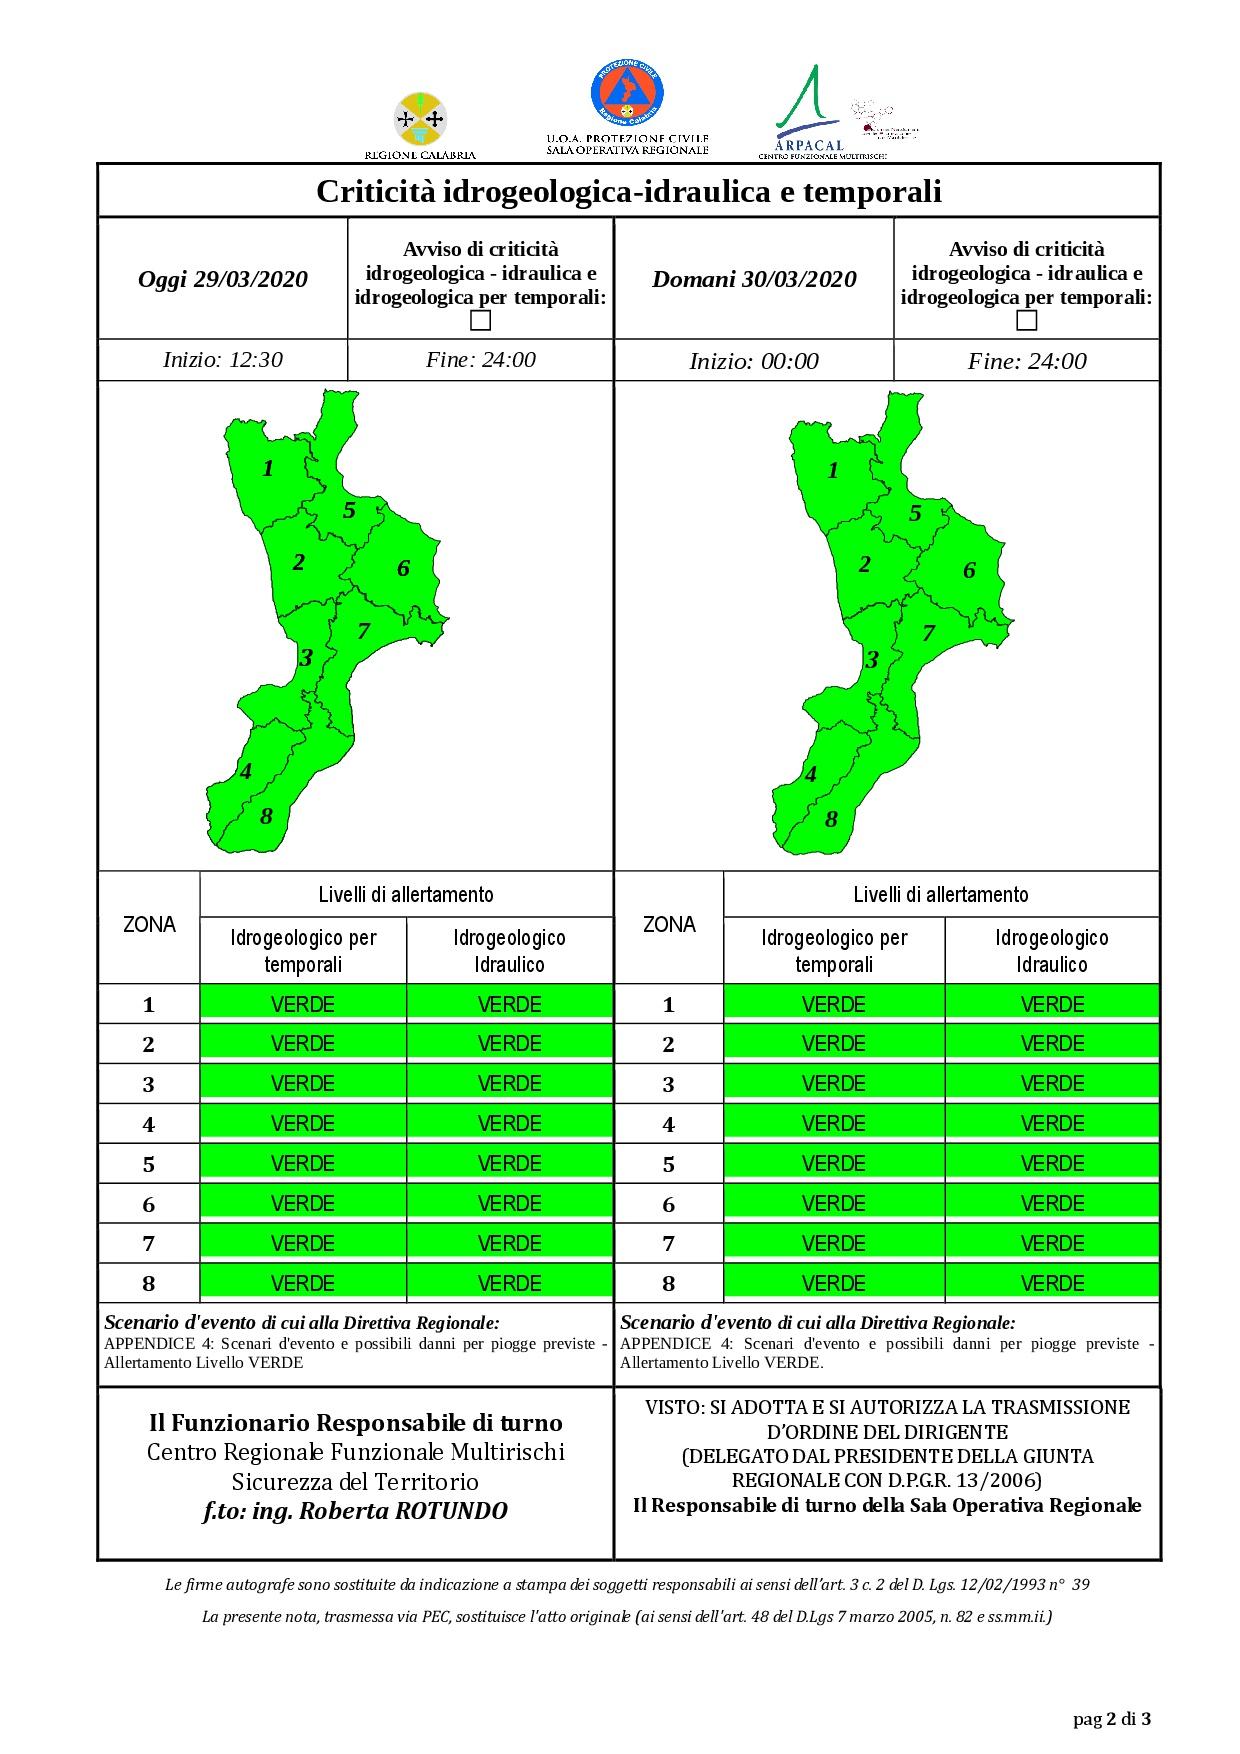 Criticità idrogeologica-idraulica e temporali in Calabria 29-03-2020